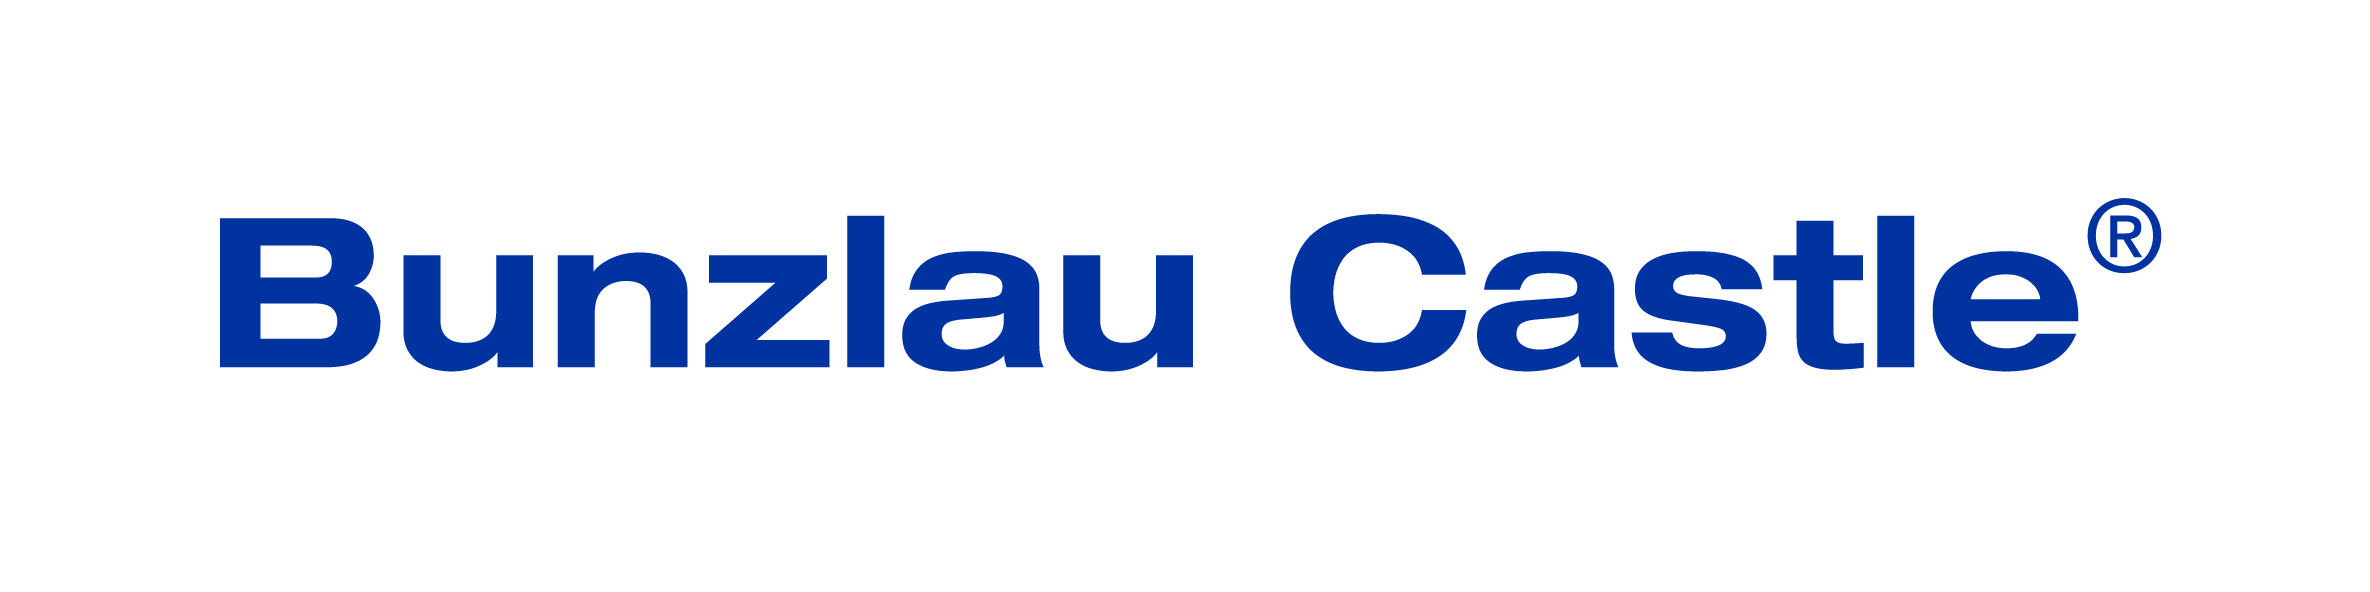 bunzlaucastle_blue_rgb.jpg